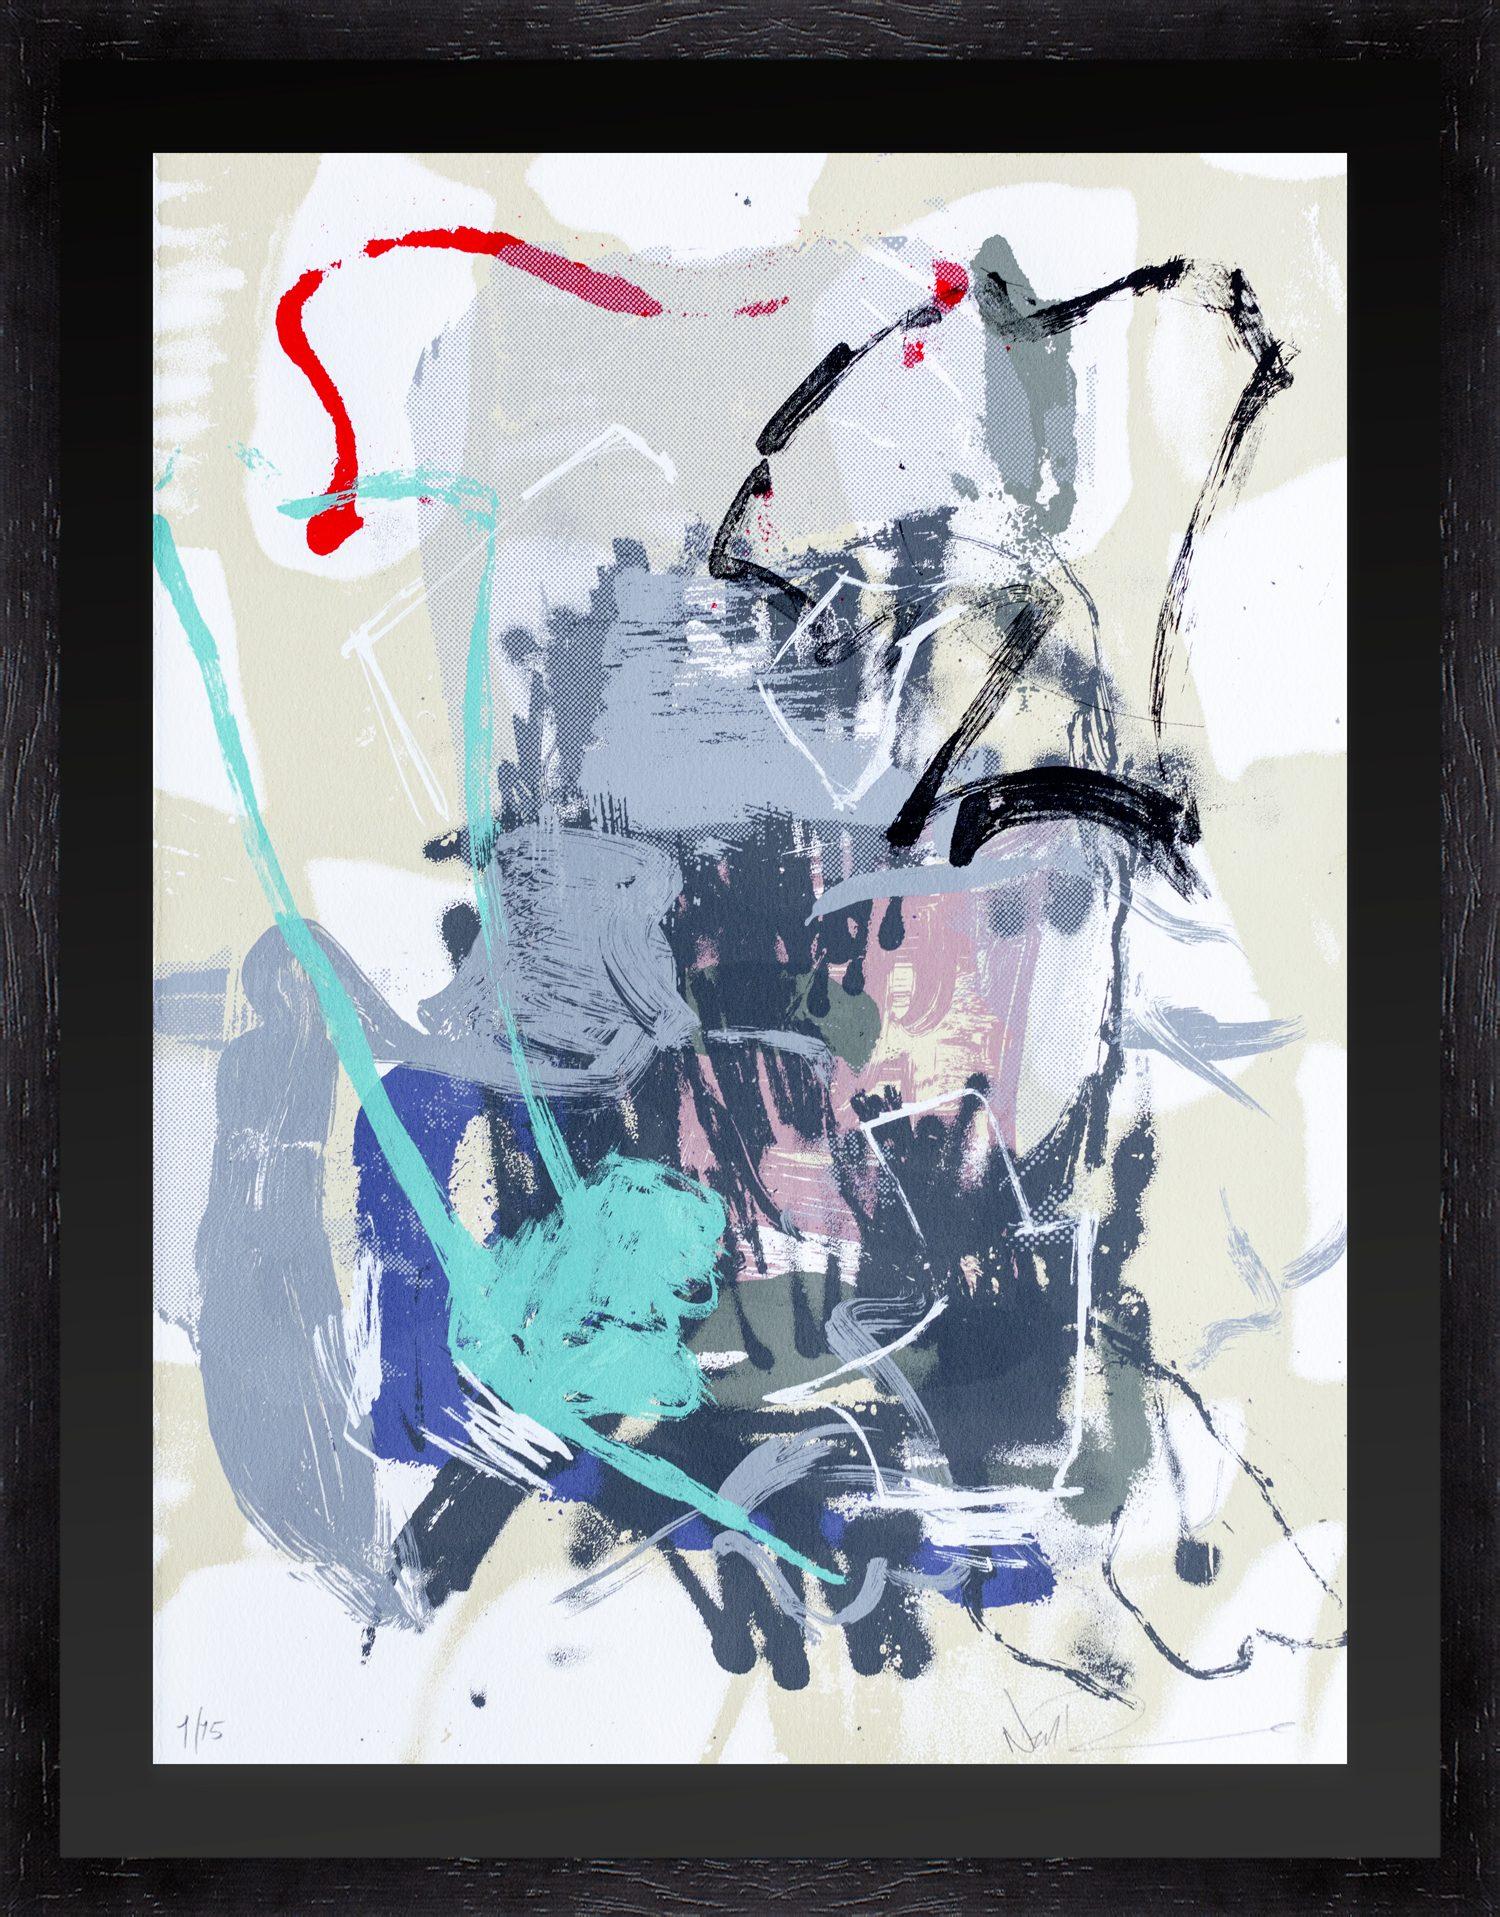 Hang Tough 'The Absurd Place' Float Framed Black on Black (Framing Only)